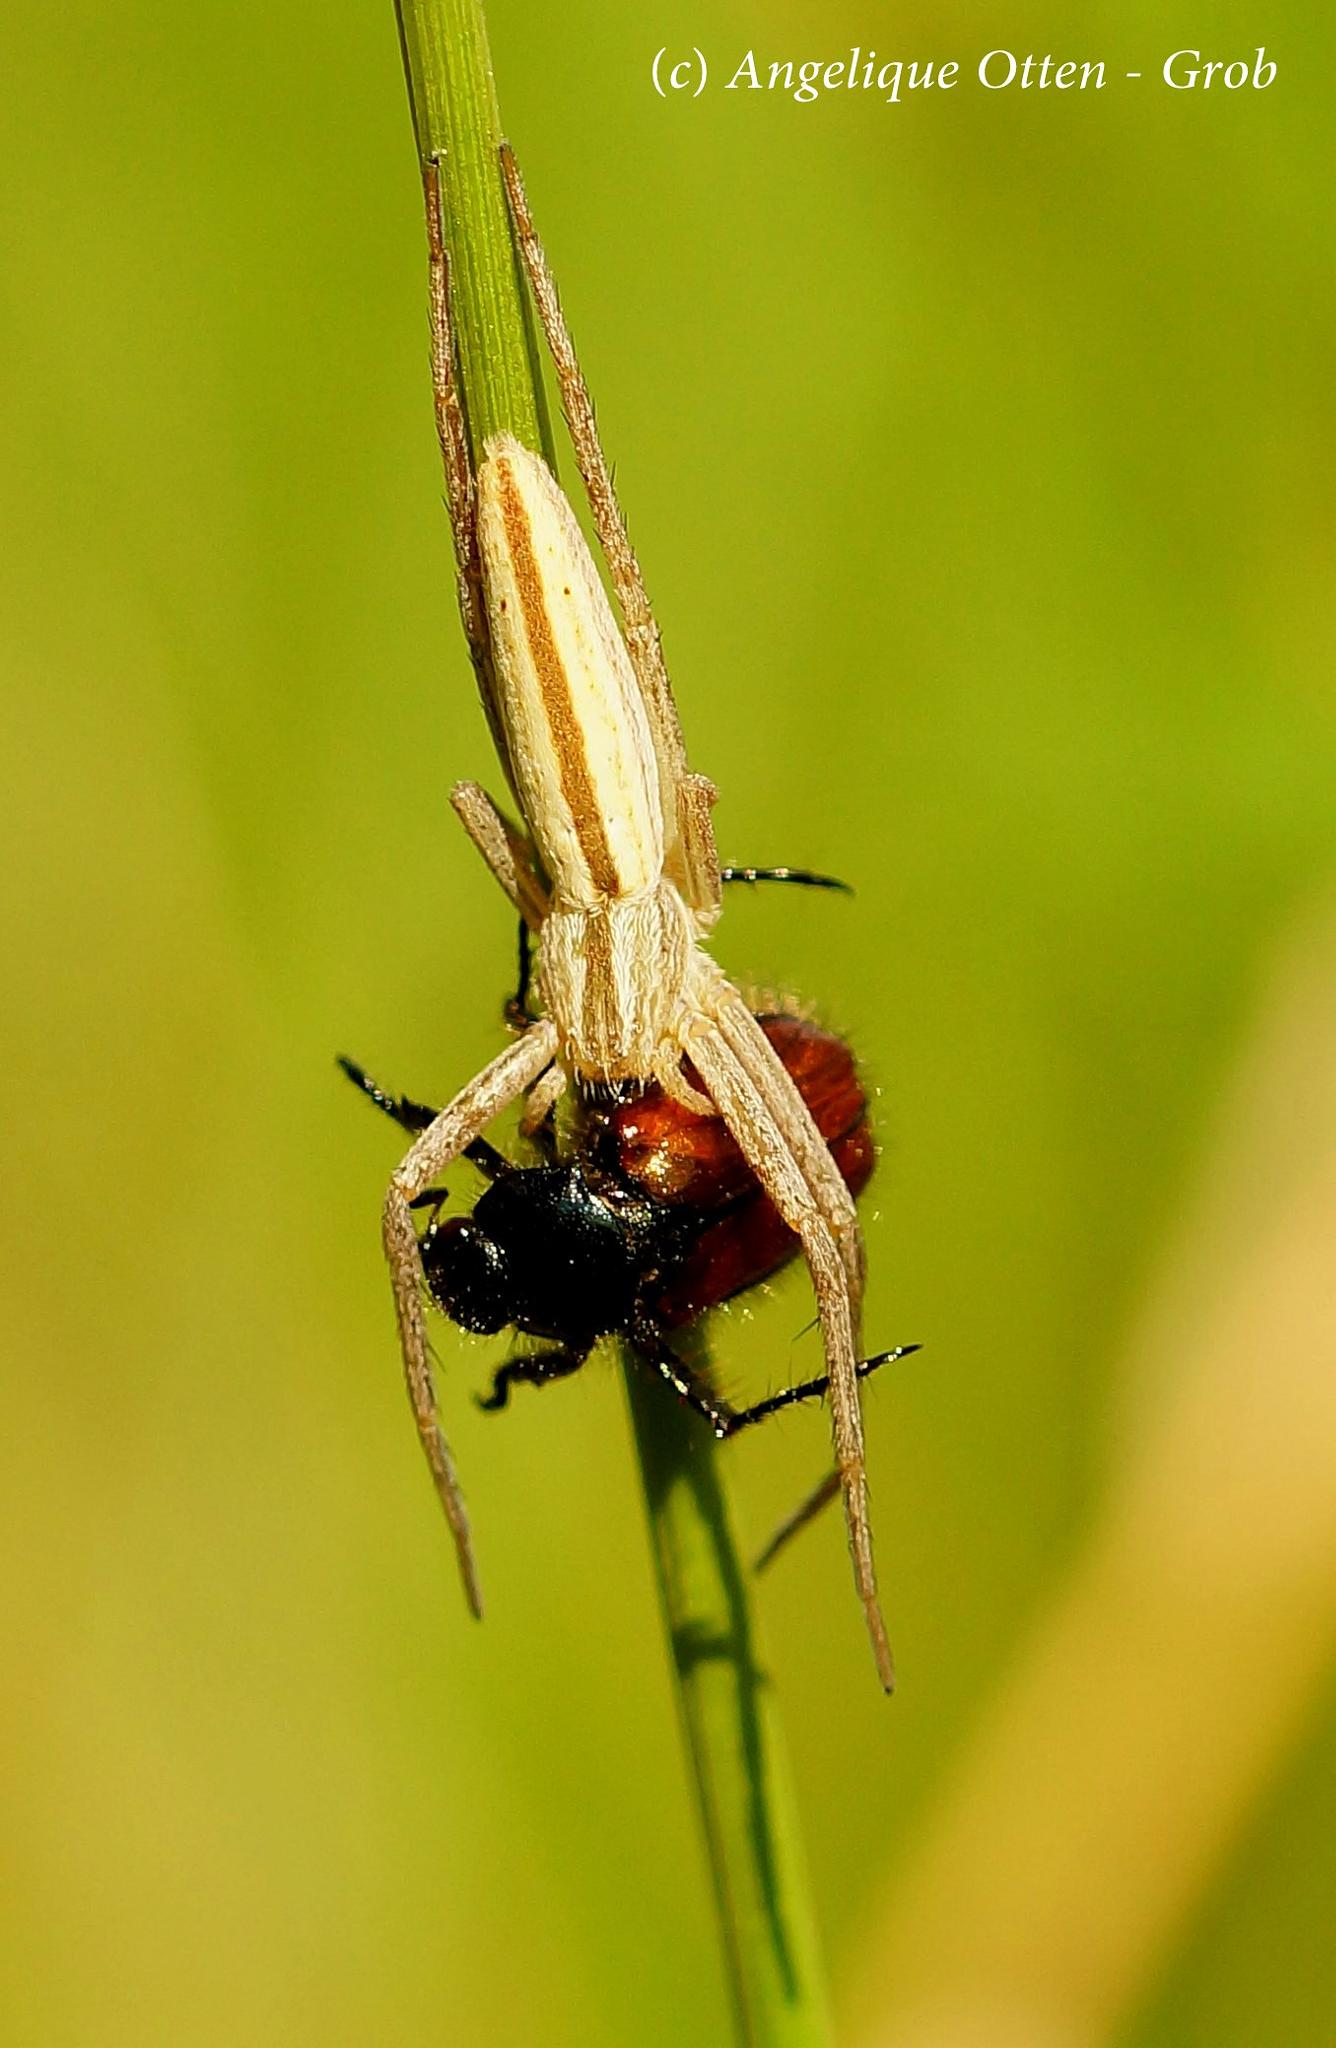 Having dinner... Spider vs beetle by Angelique Otten - Grob